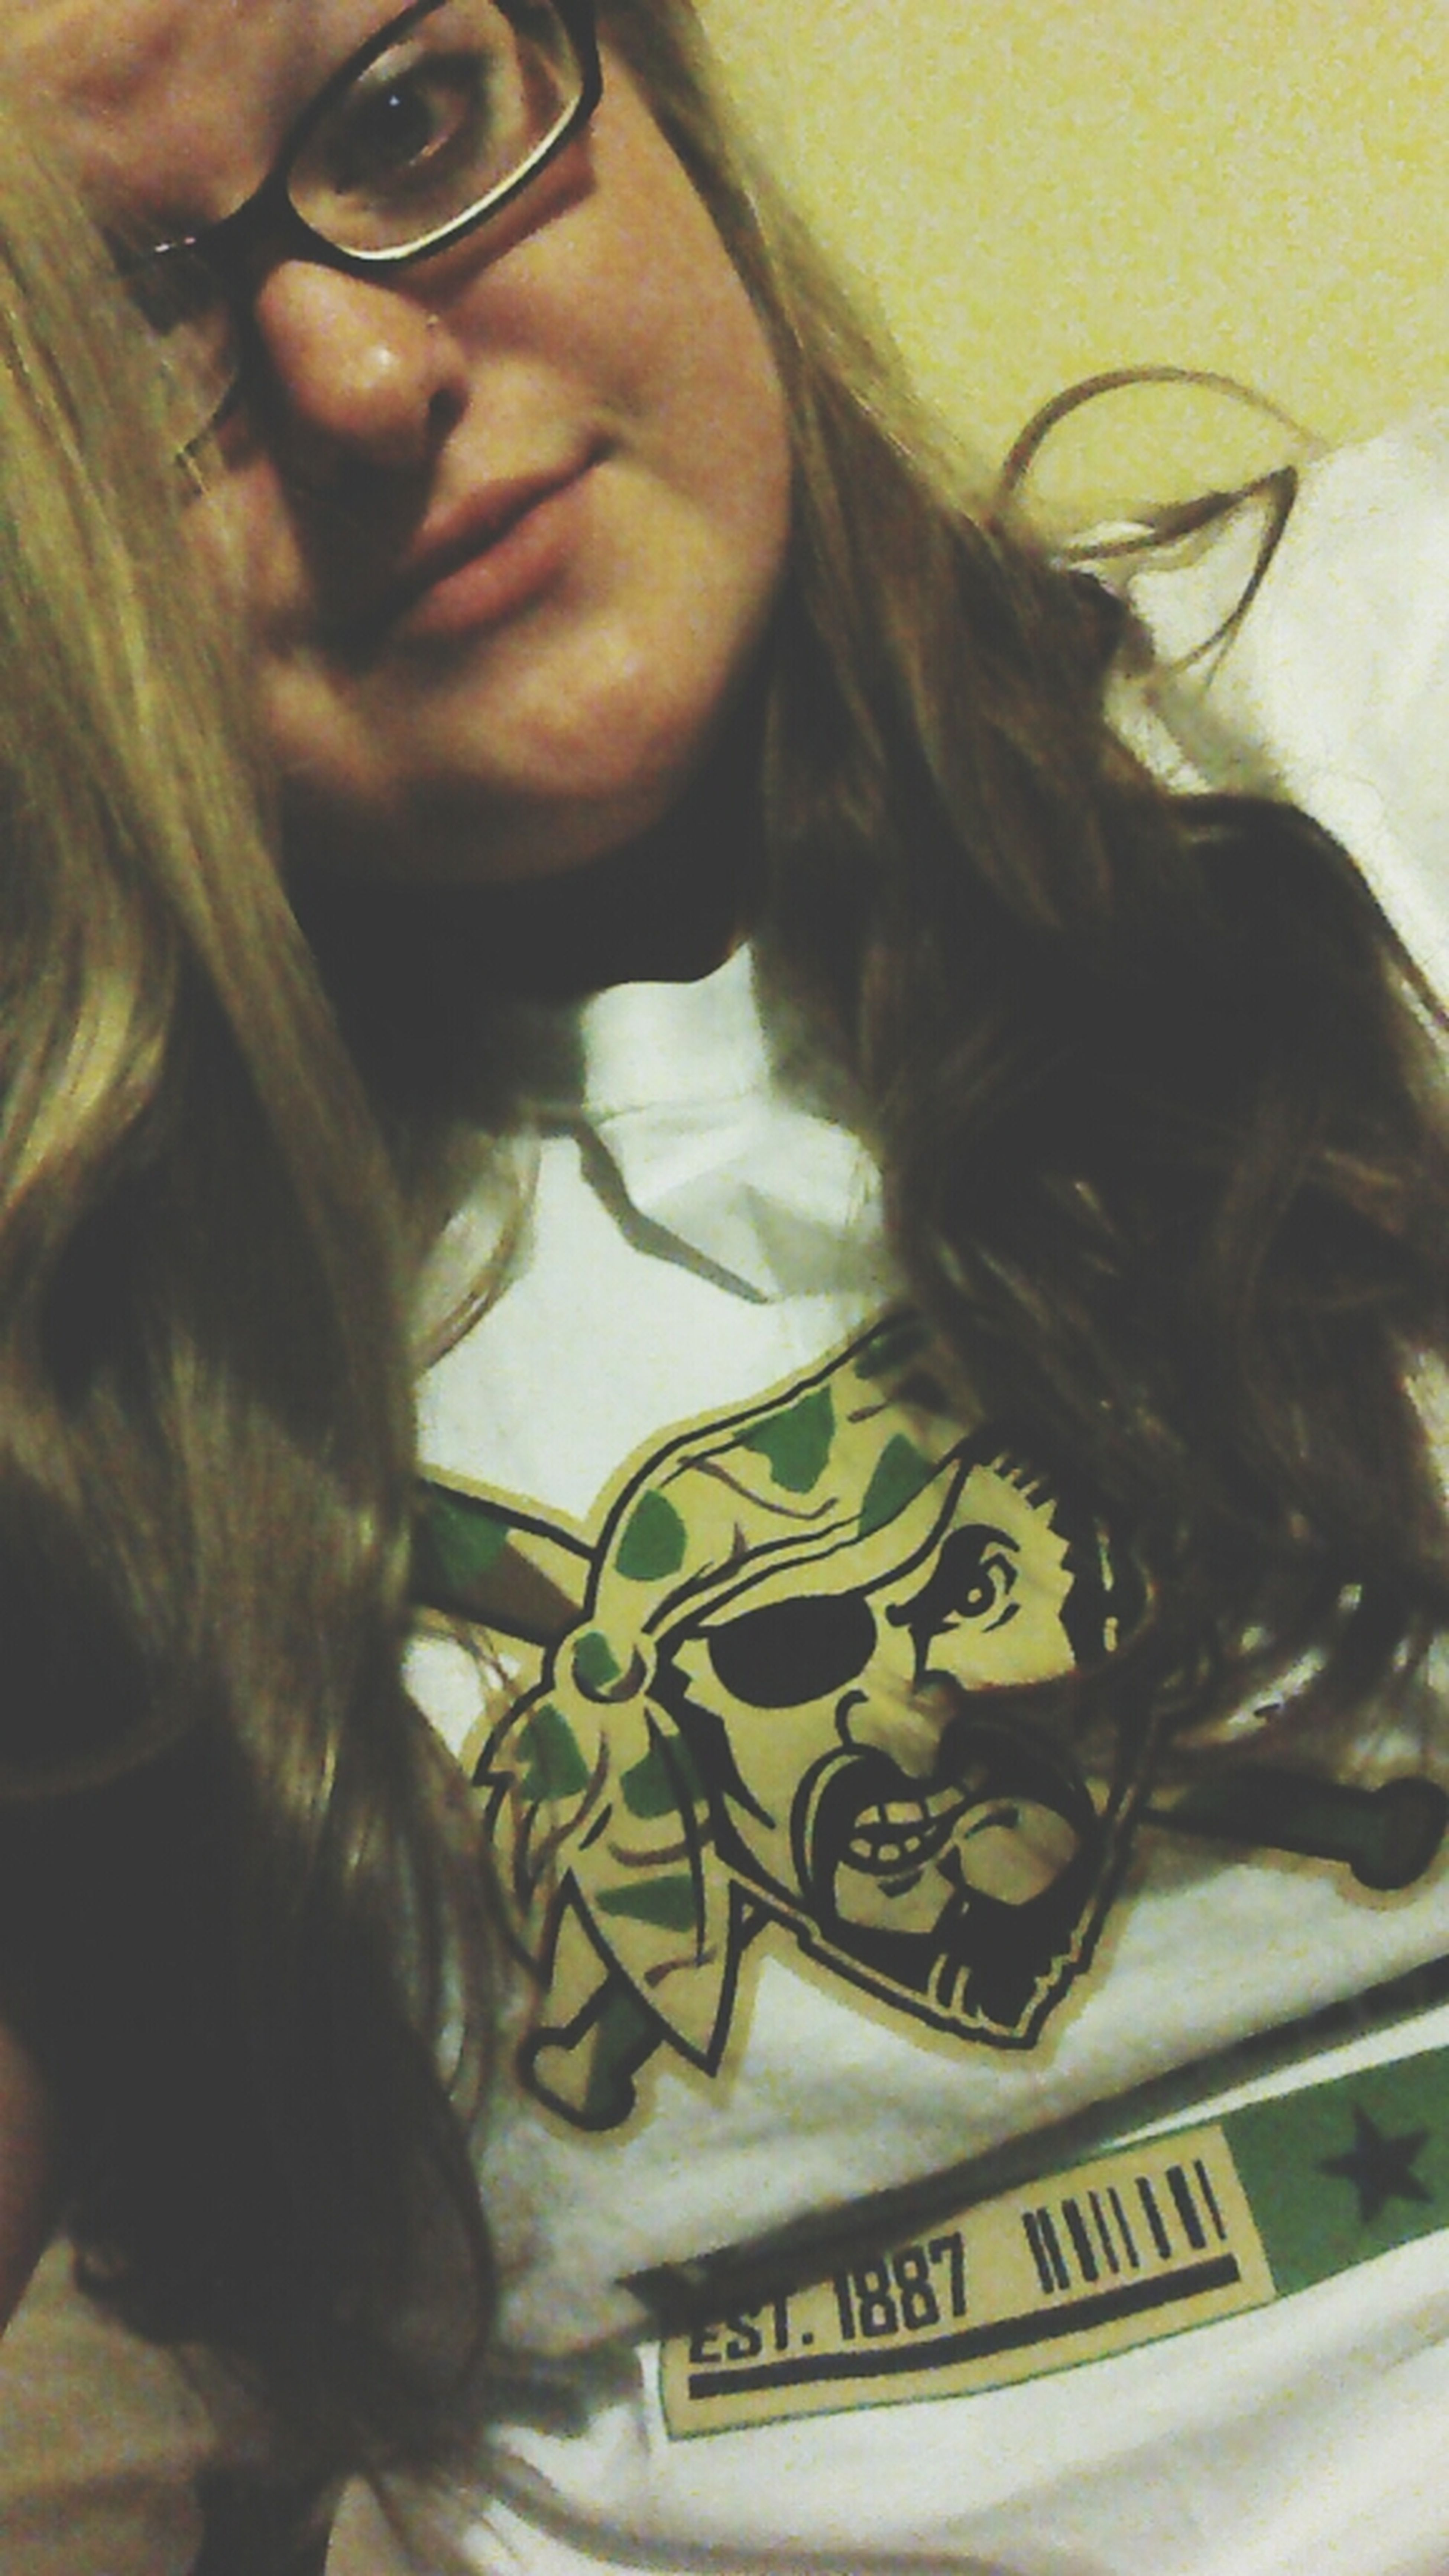 free shirt, ain't bad. ;)